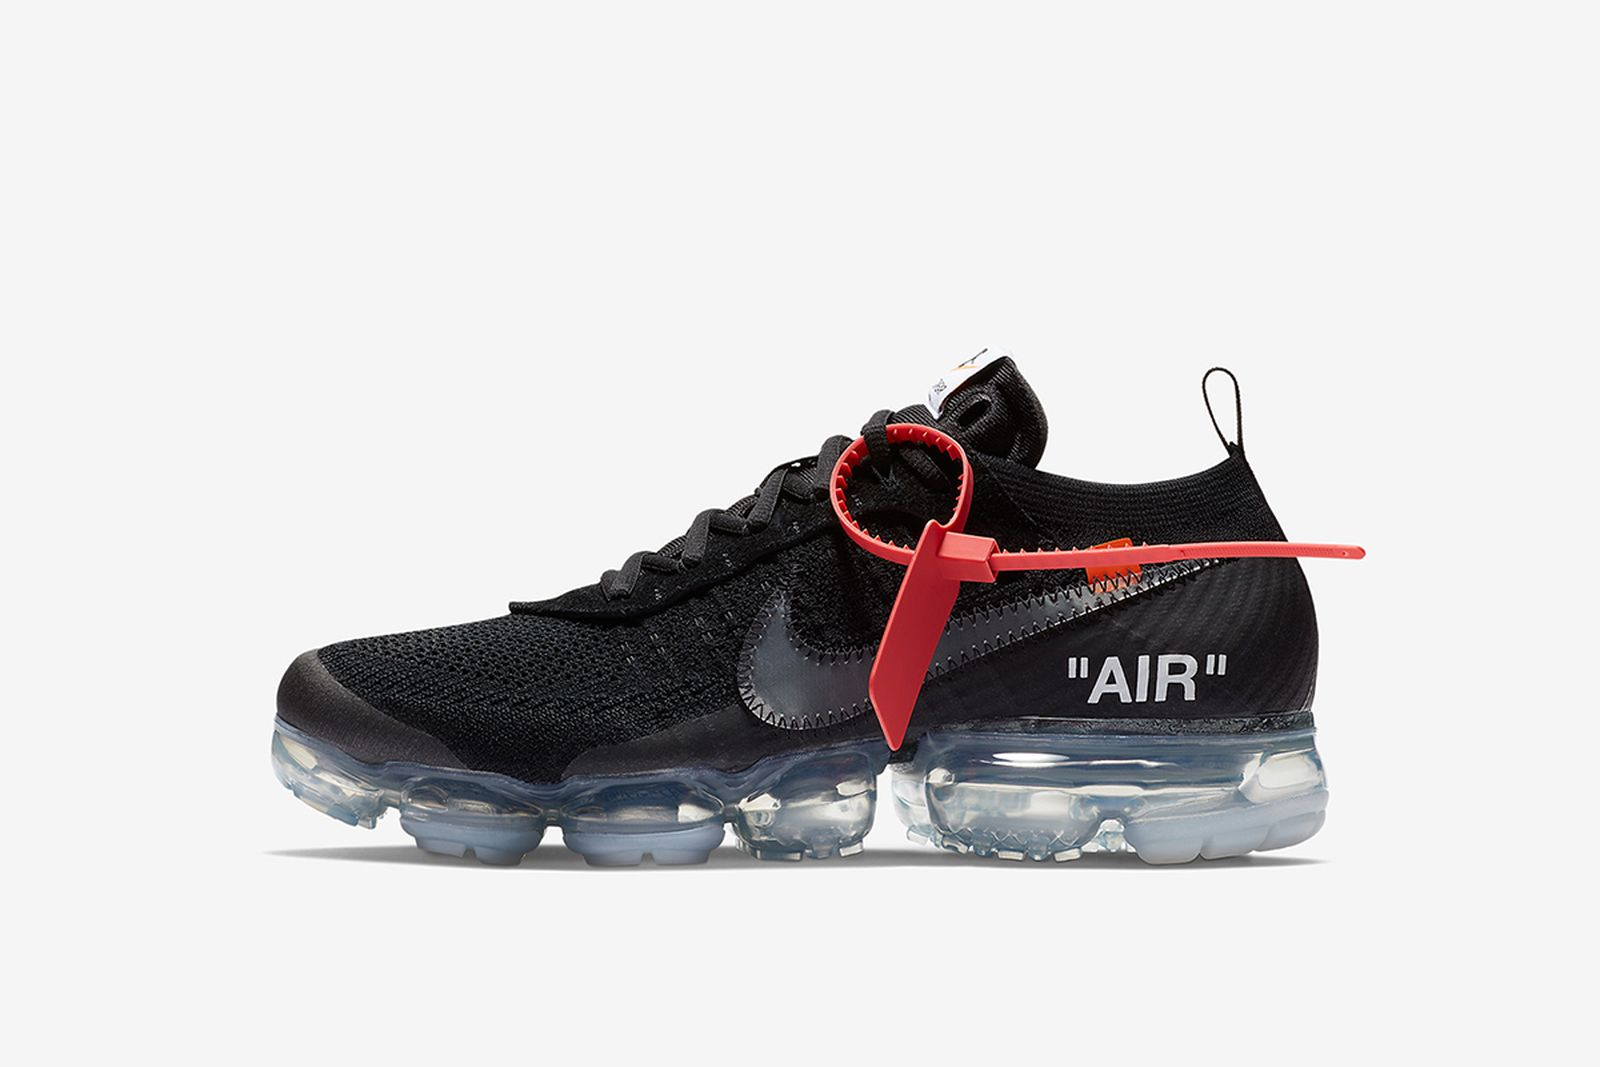 vapormax black GOAT Nike The Ten OFF-WHITE c/o Virgil Abloh